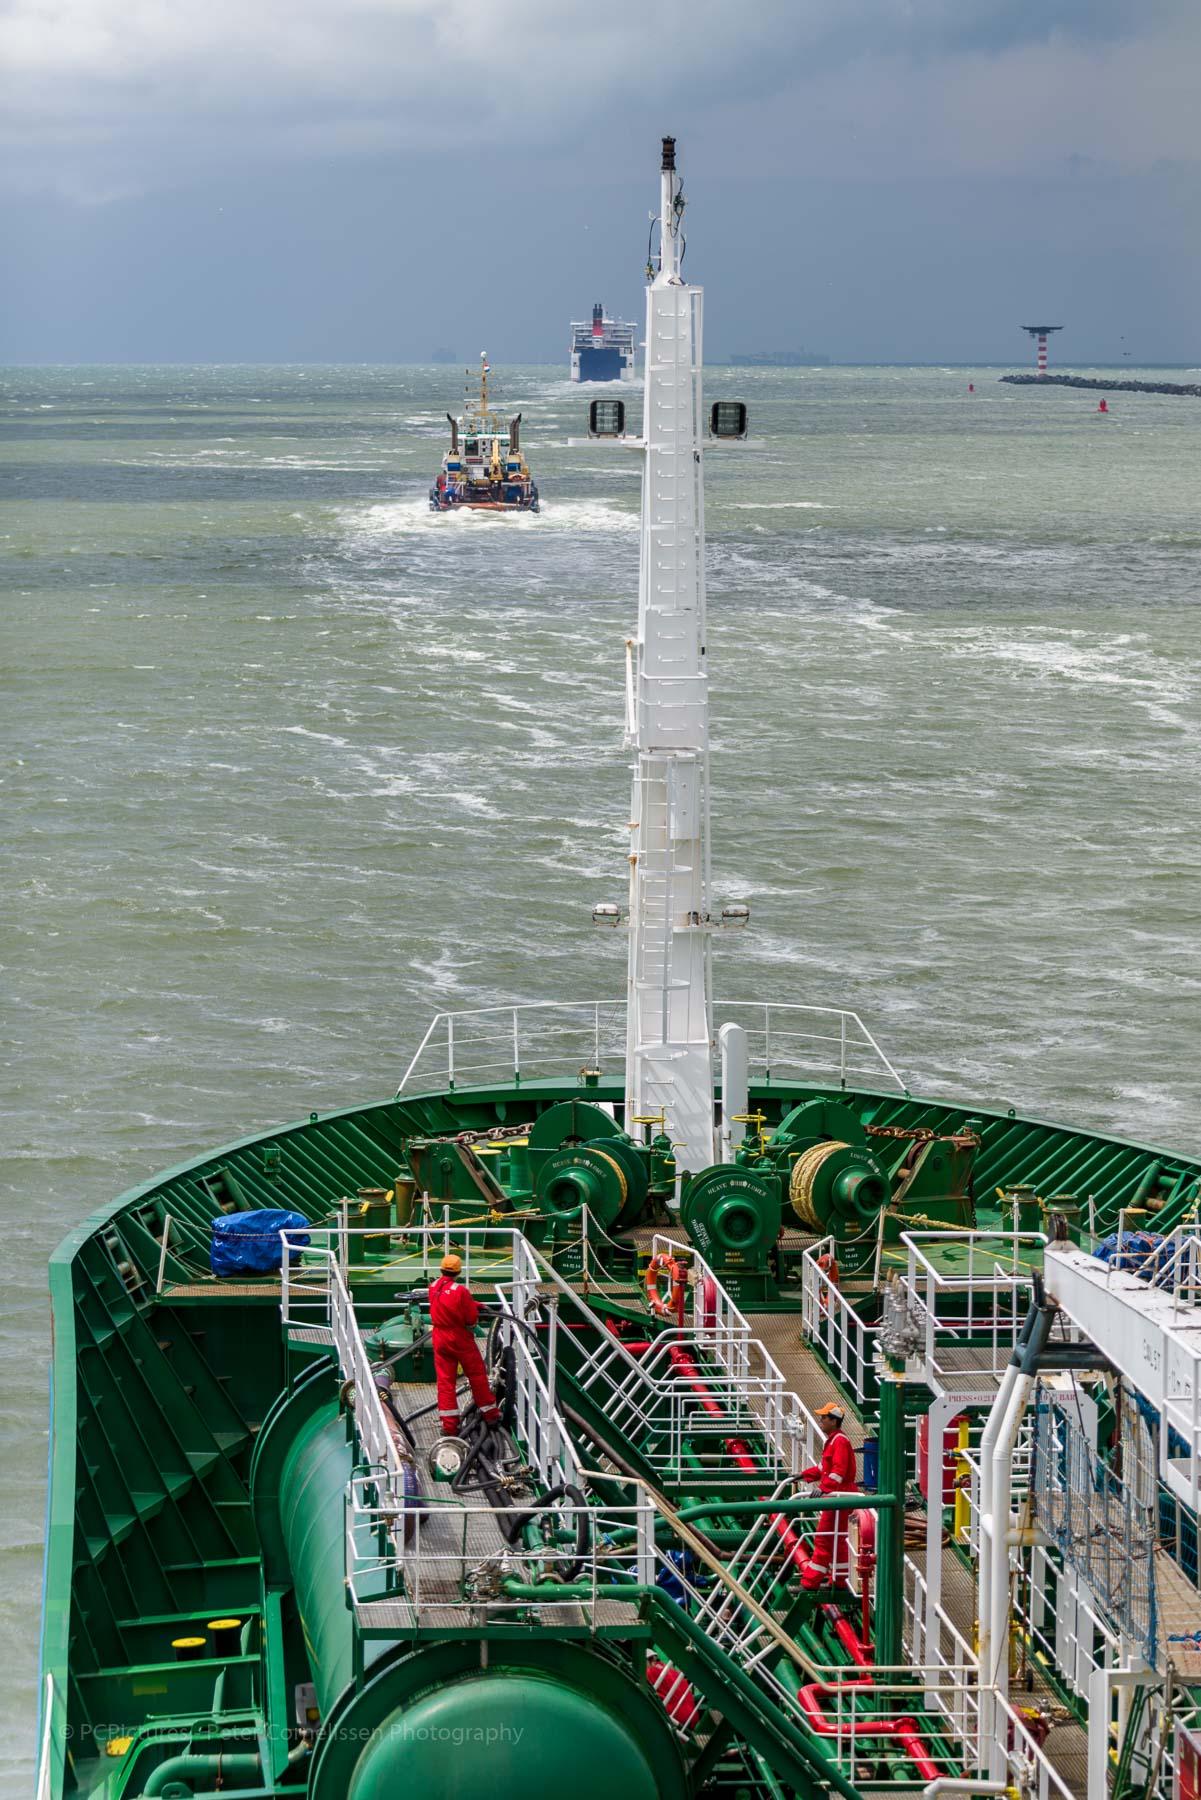 Holland, Nederland, Netherlands, Oil / Chemical Tankers, Olie / Chemicalieën tankers, Places, Rotterdam, Schepen, Shipping, Ships, Tankers, Thun Gothenburg, scheepvaart, zeevaart